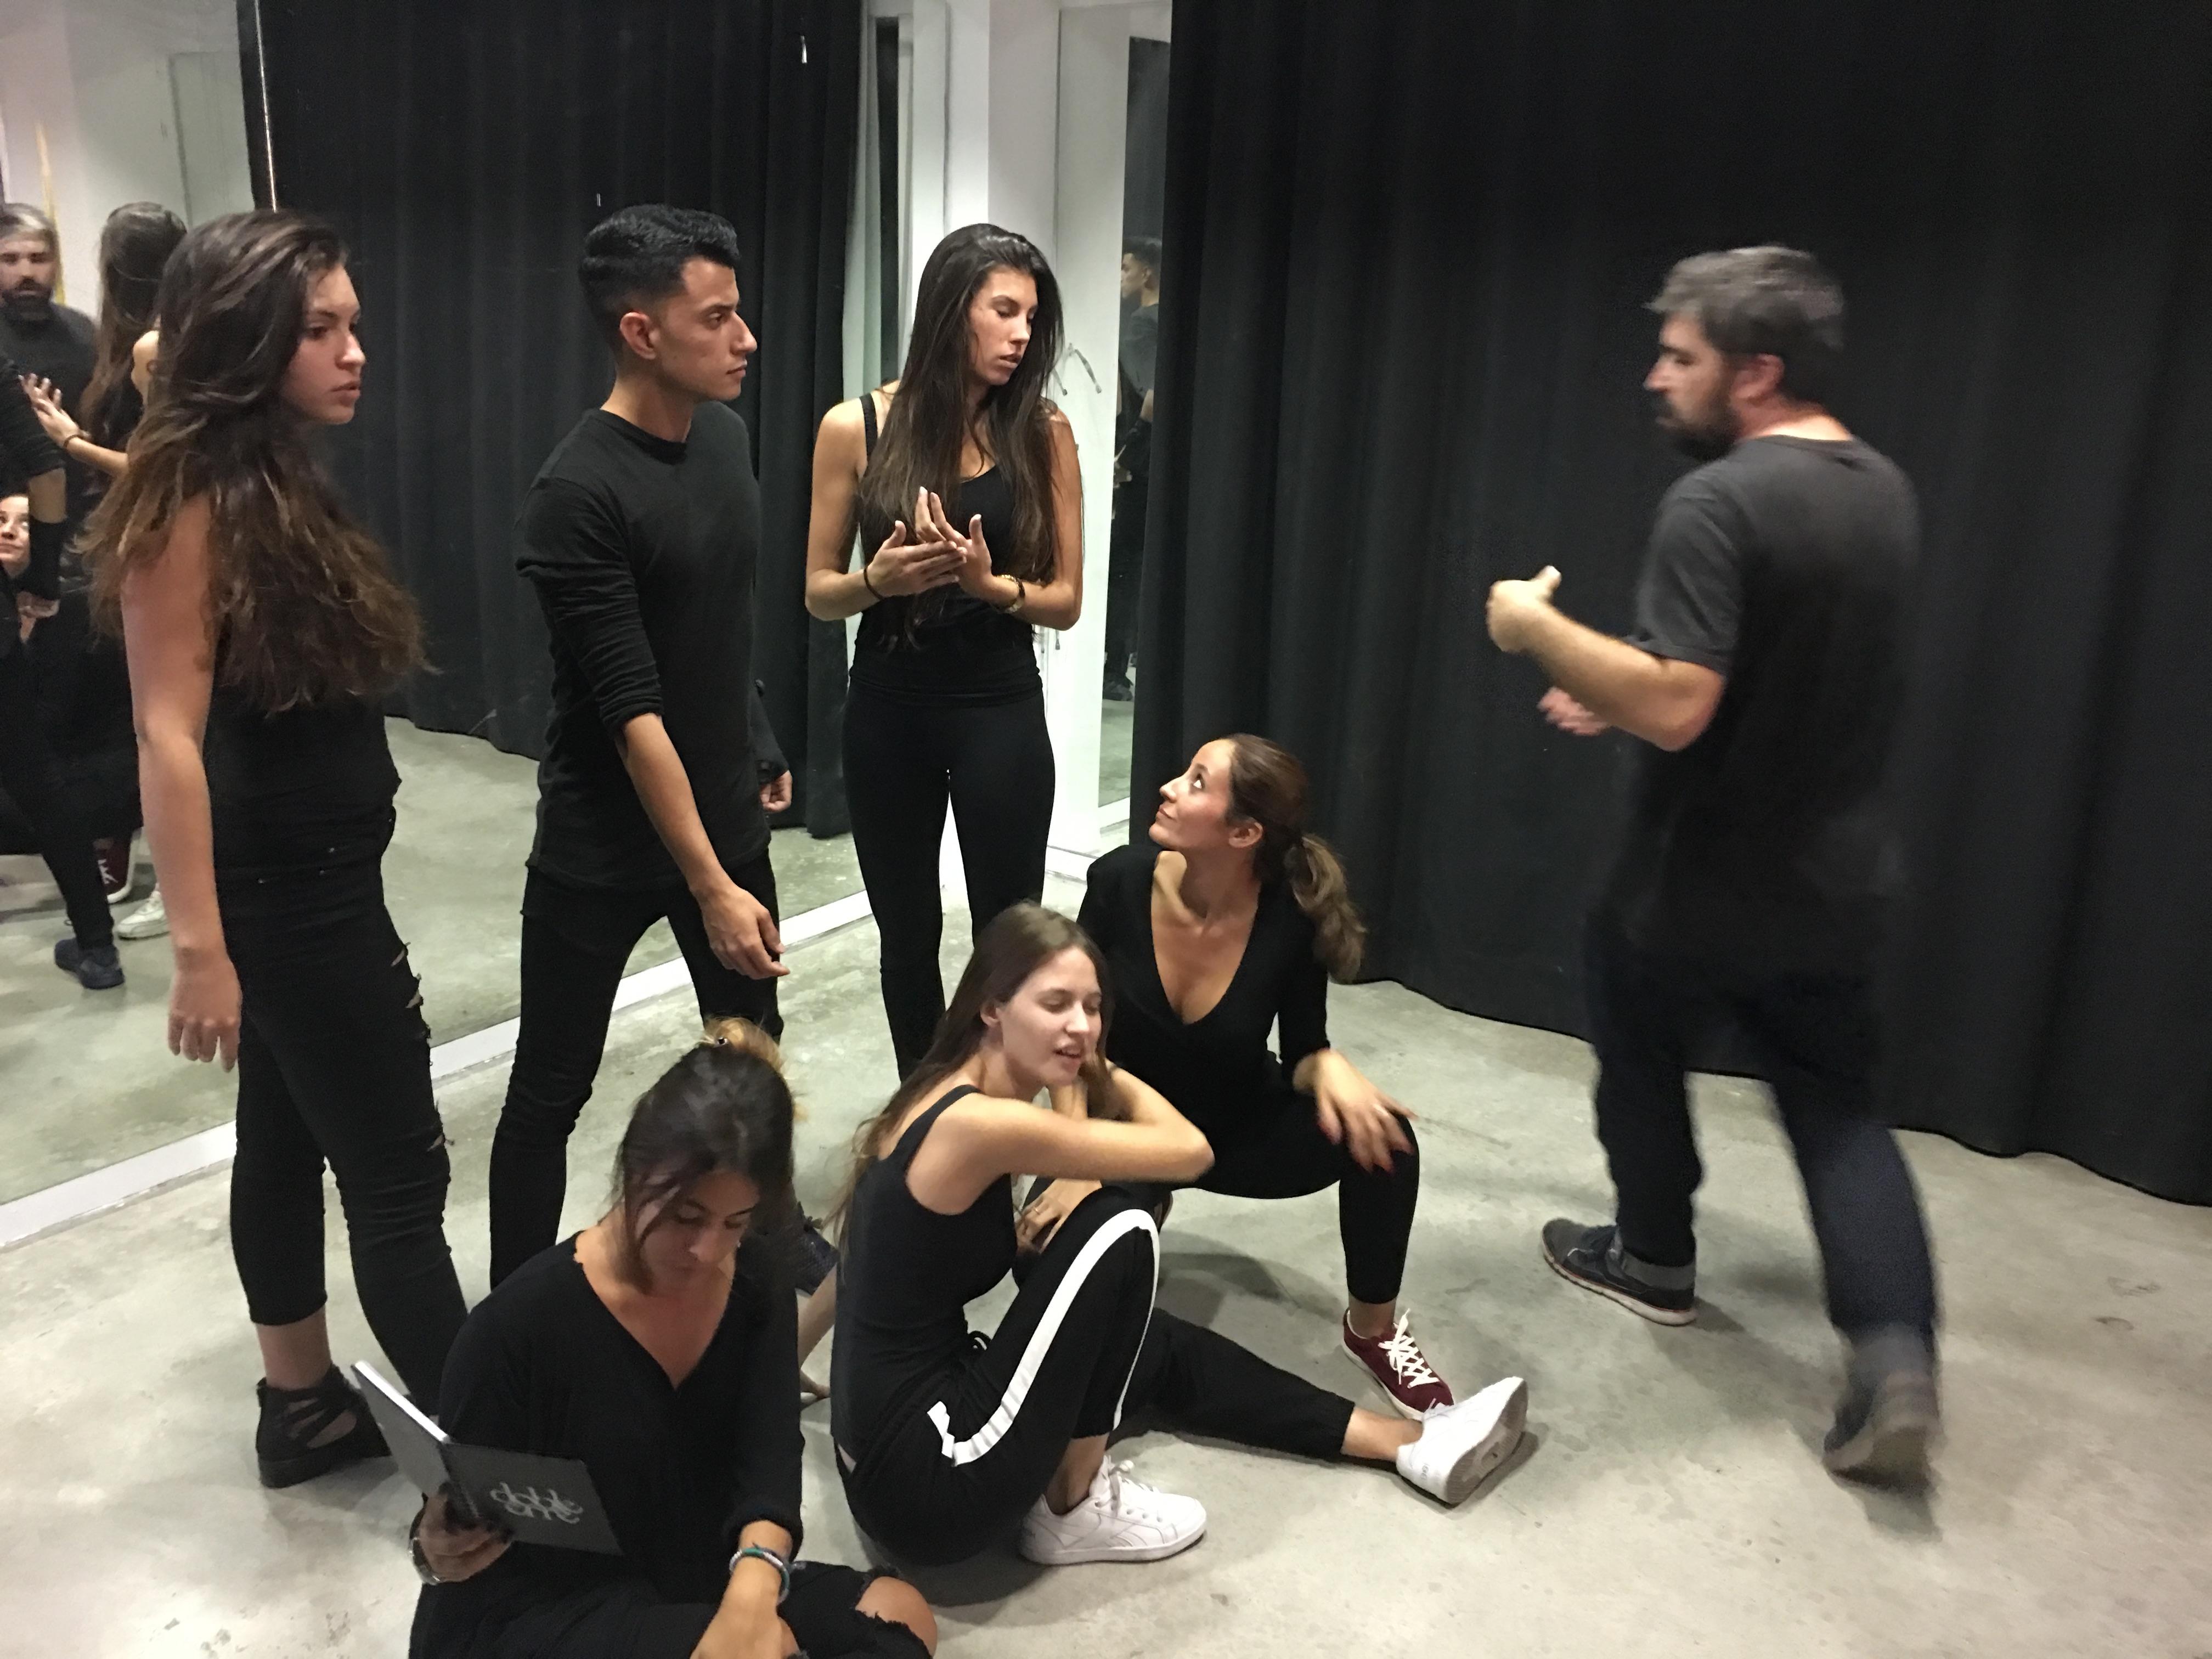 Clases de teatro Doble Erre nov. 16 (4)